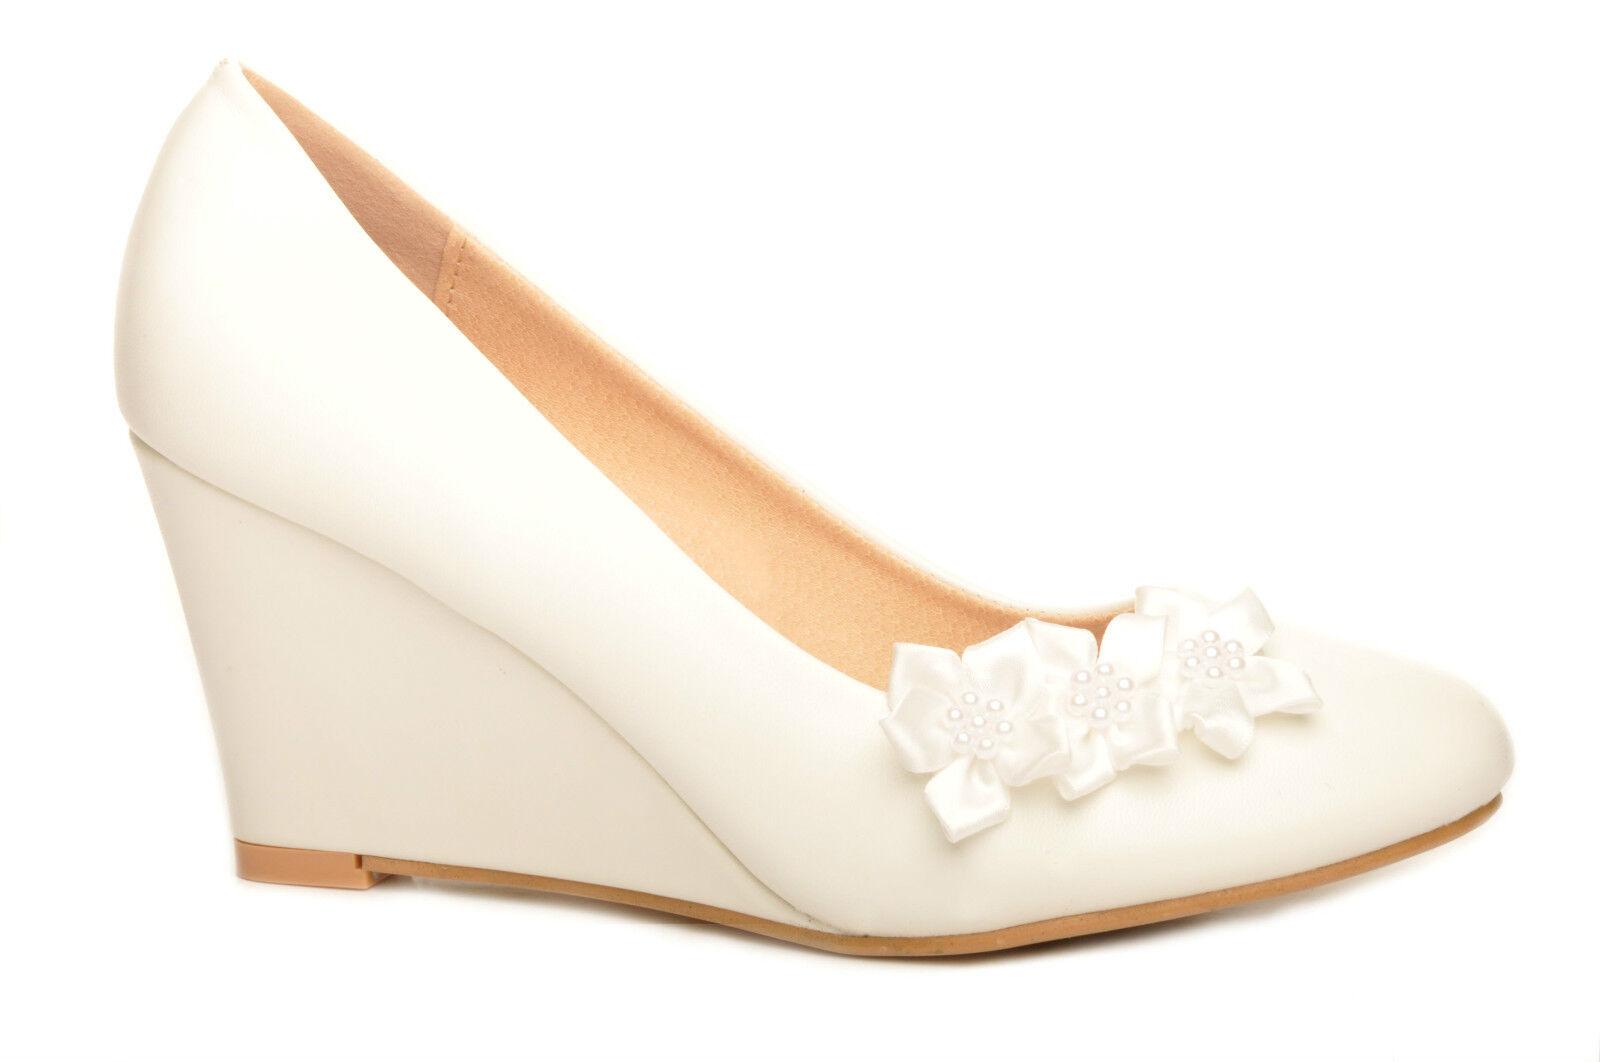 Off White Delicate Satin Flower Detail Wedge Bridal Wedding Heels